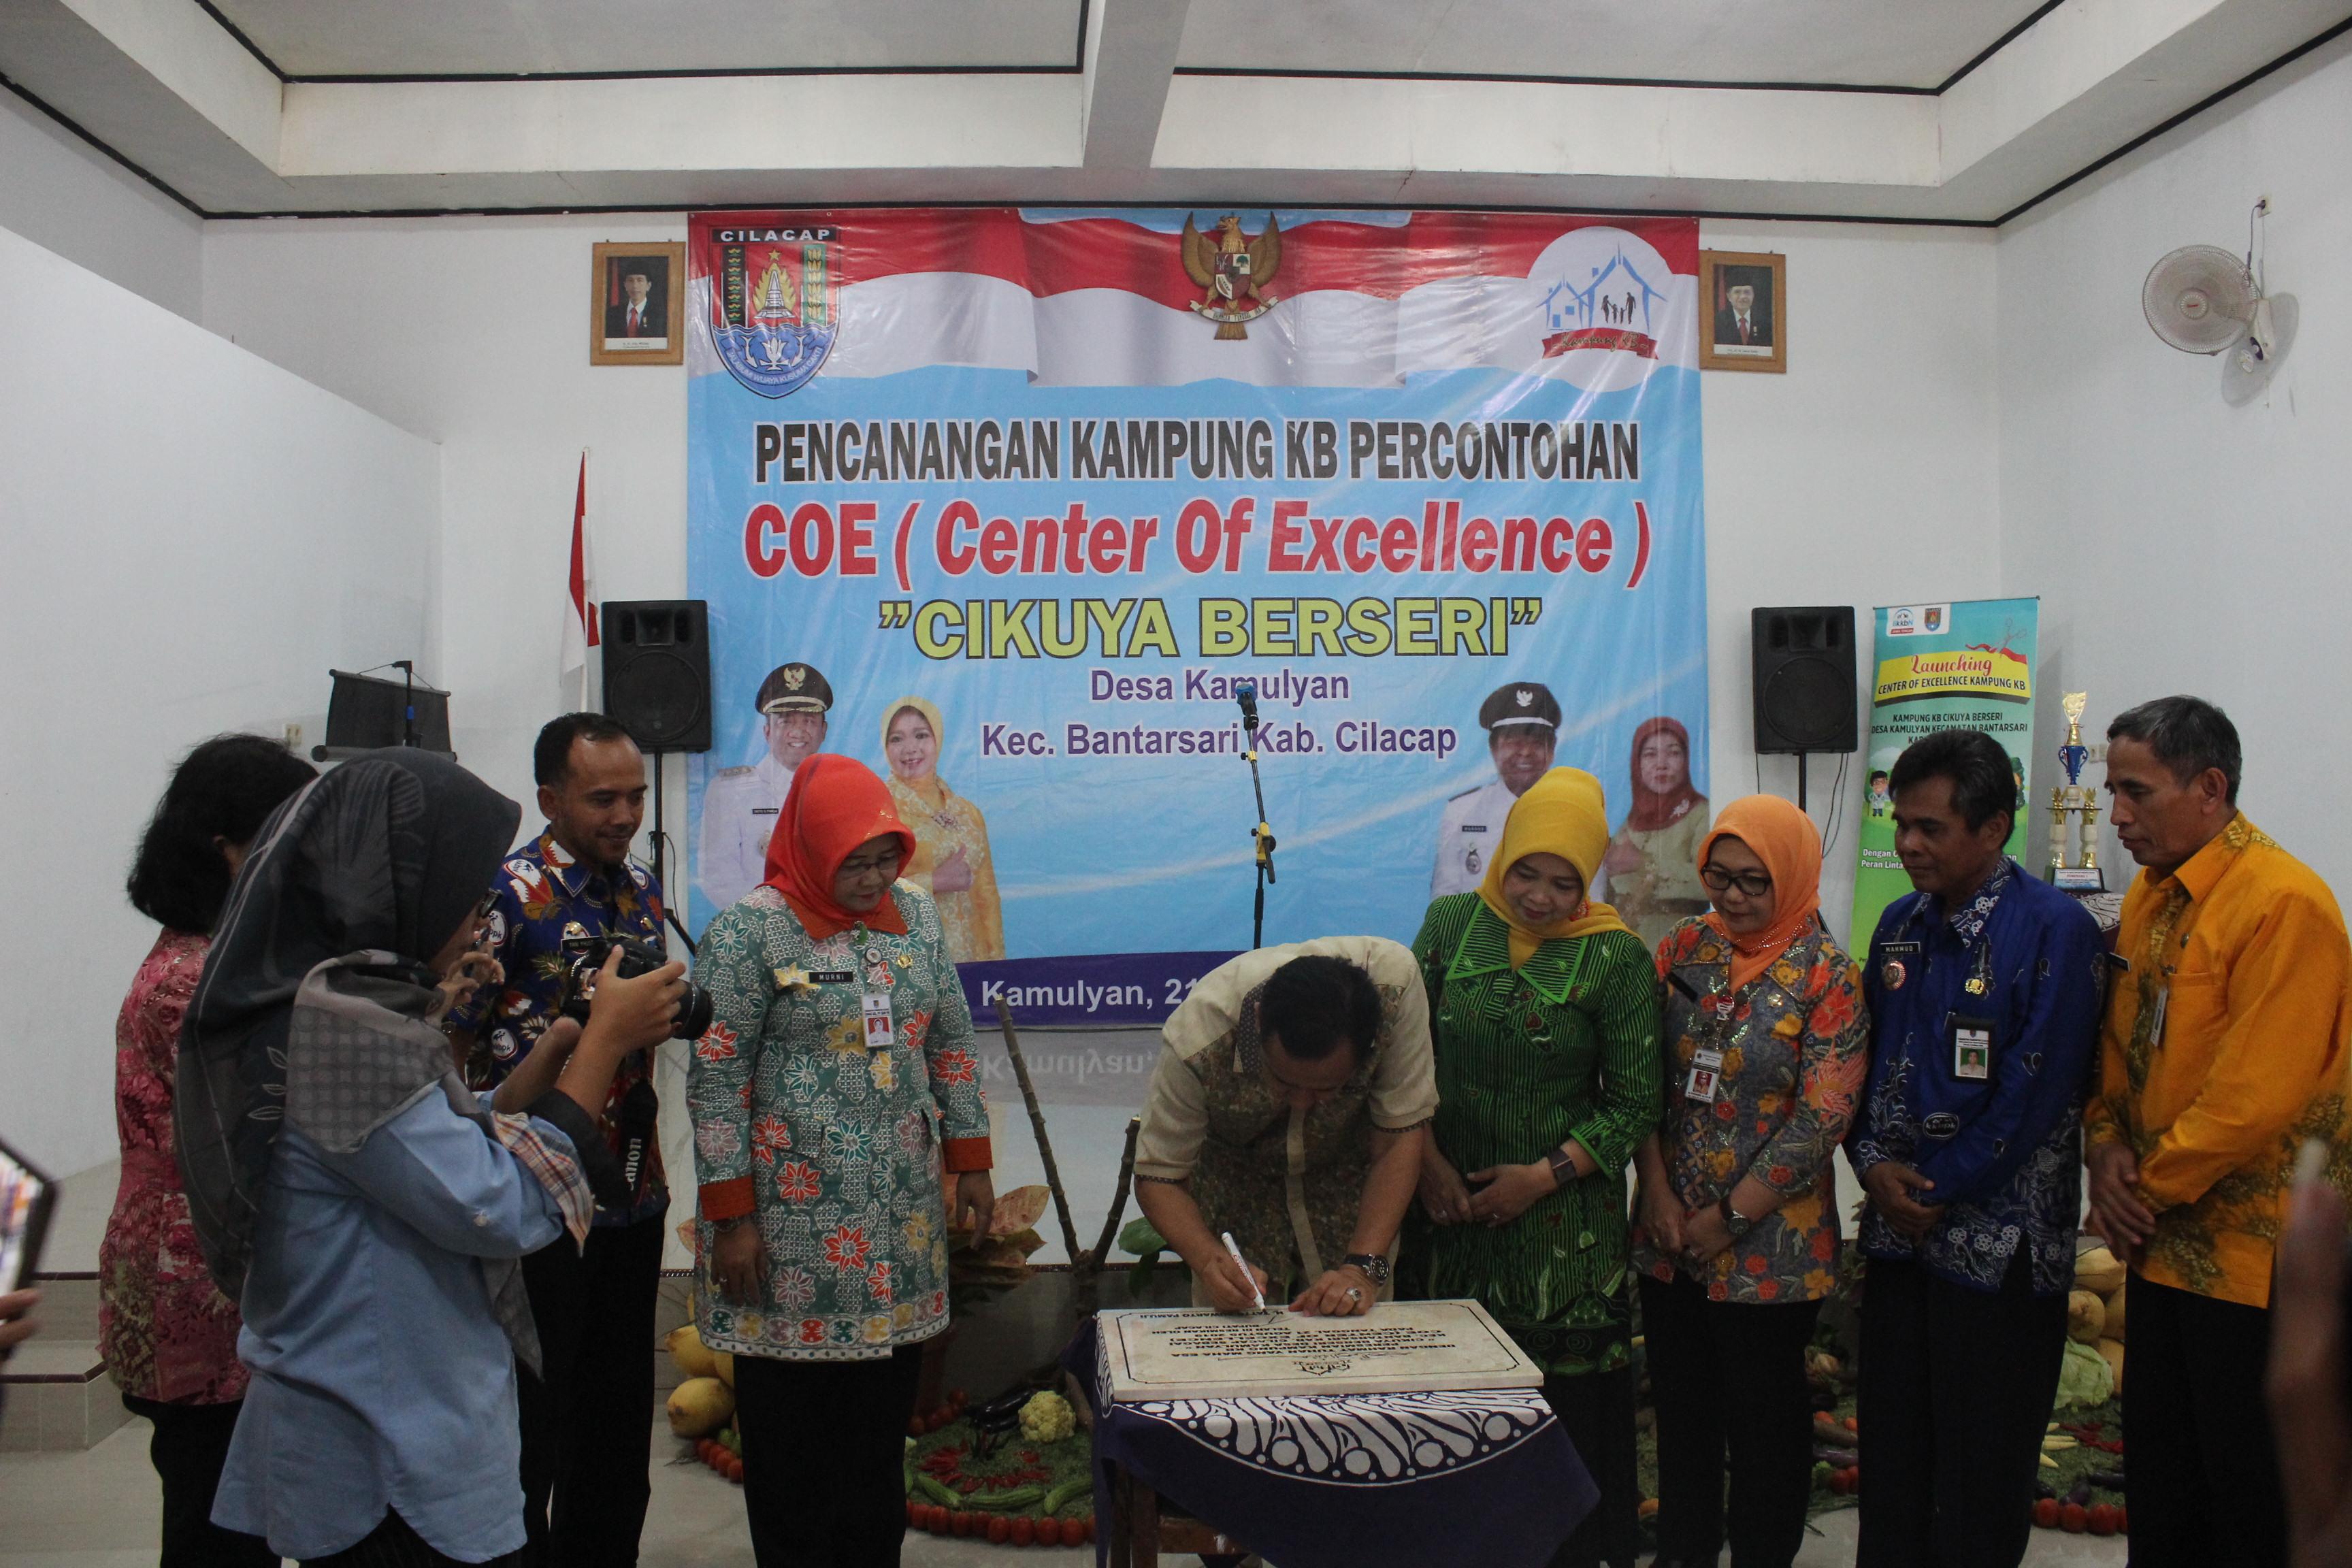 "Pencangan Kampung KB Percontohan (Center Of Excellence) ""Cikuya Berseri"""